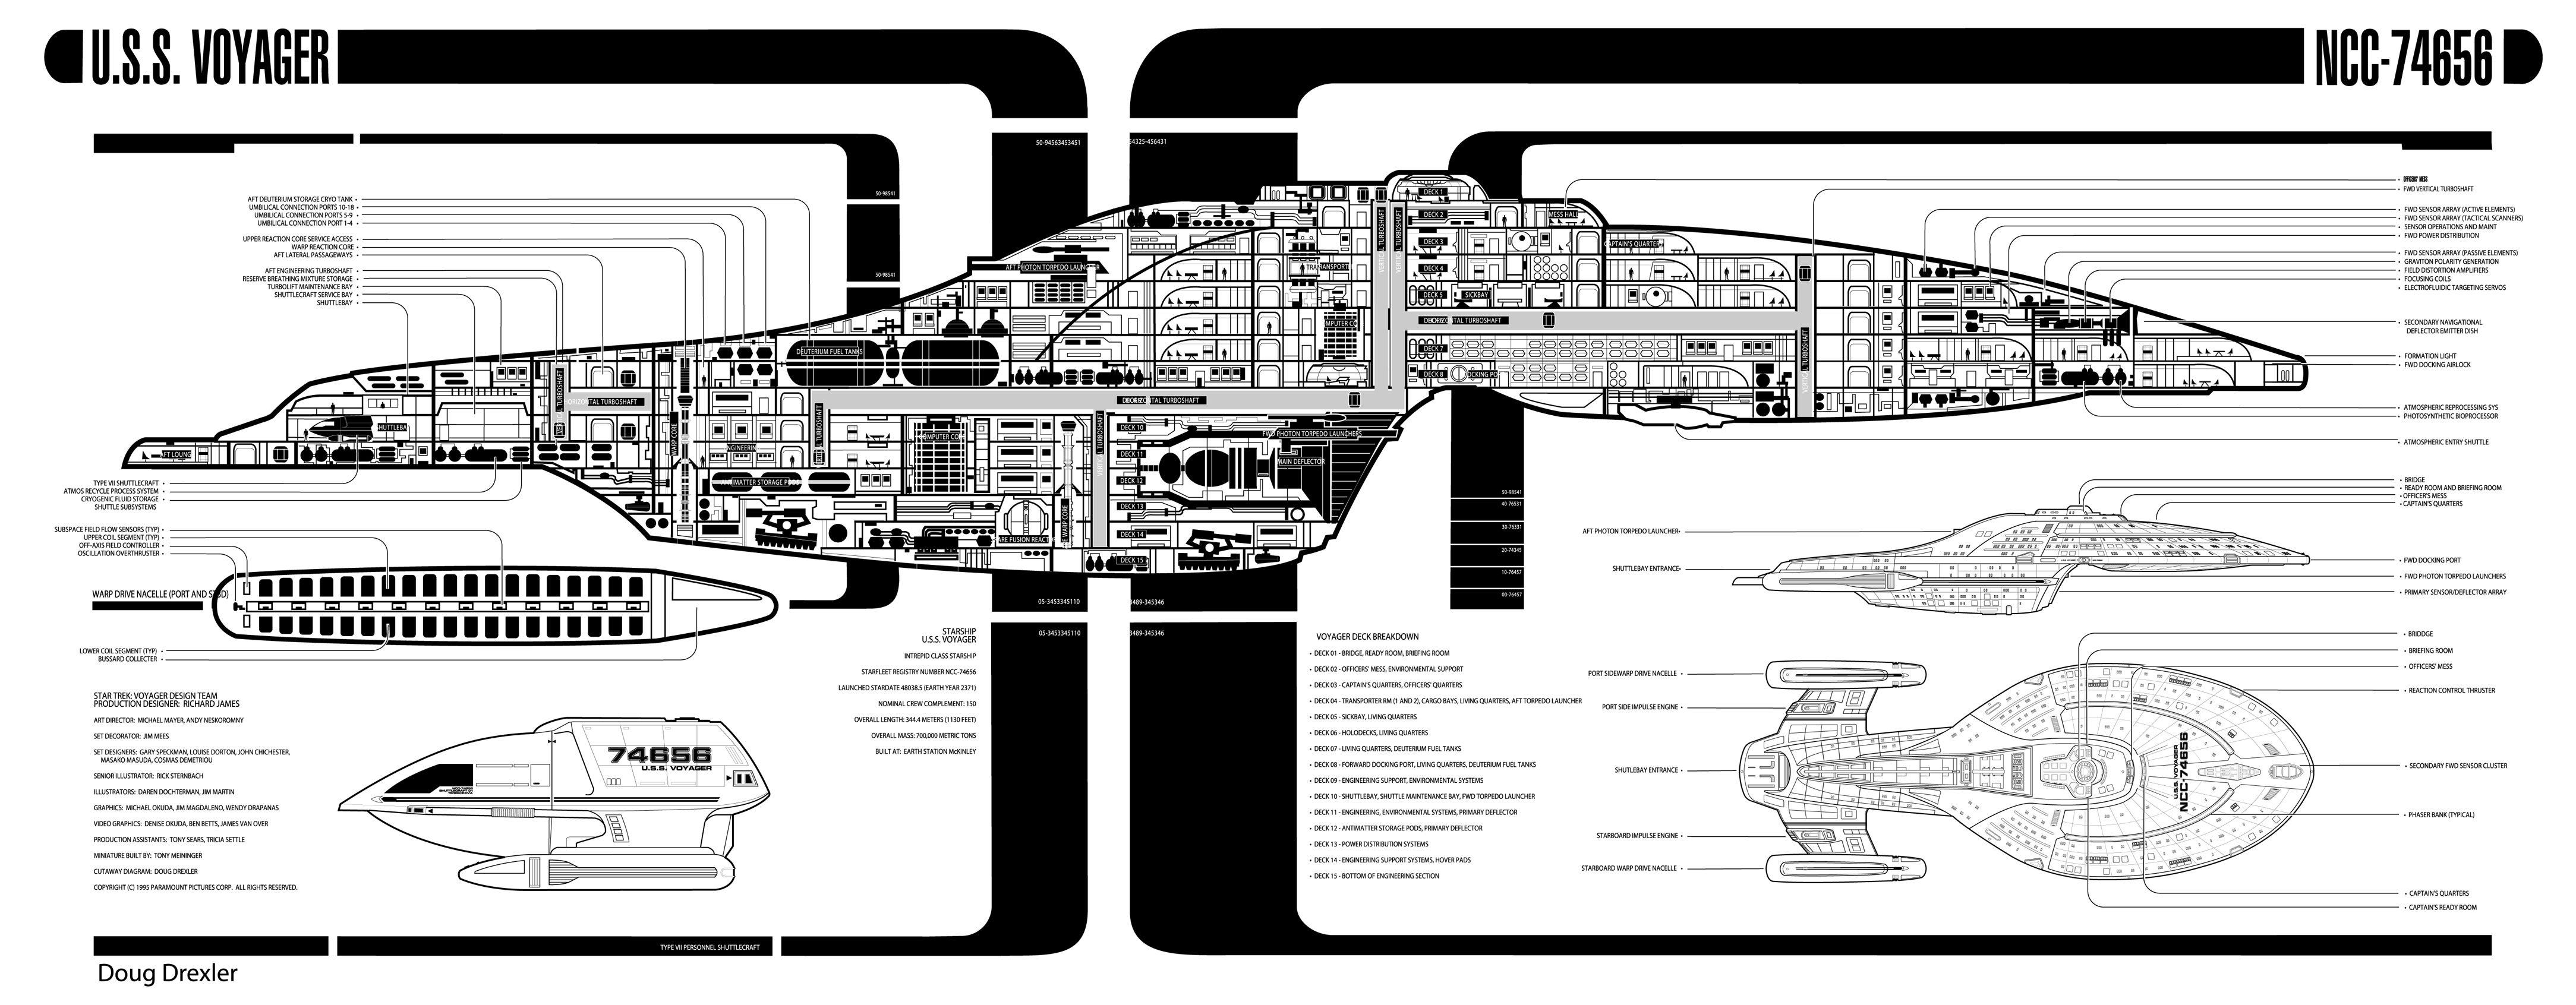 Star trek voyager spacecraft - Intrepid Class Starship Uss Voyager Ncc 74656 Cut Away Blueprint Outline Star